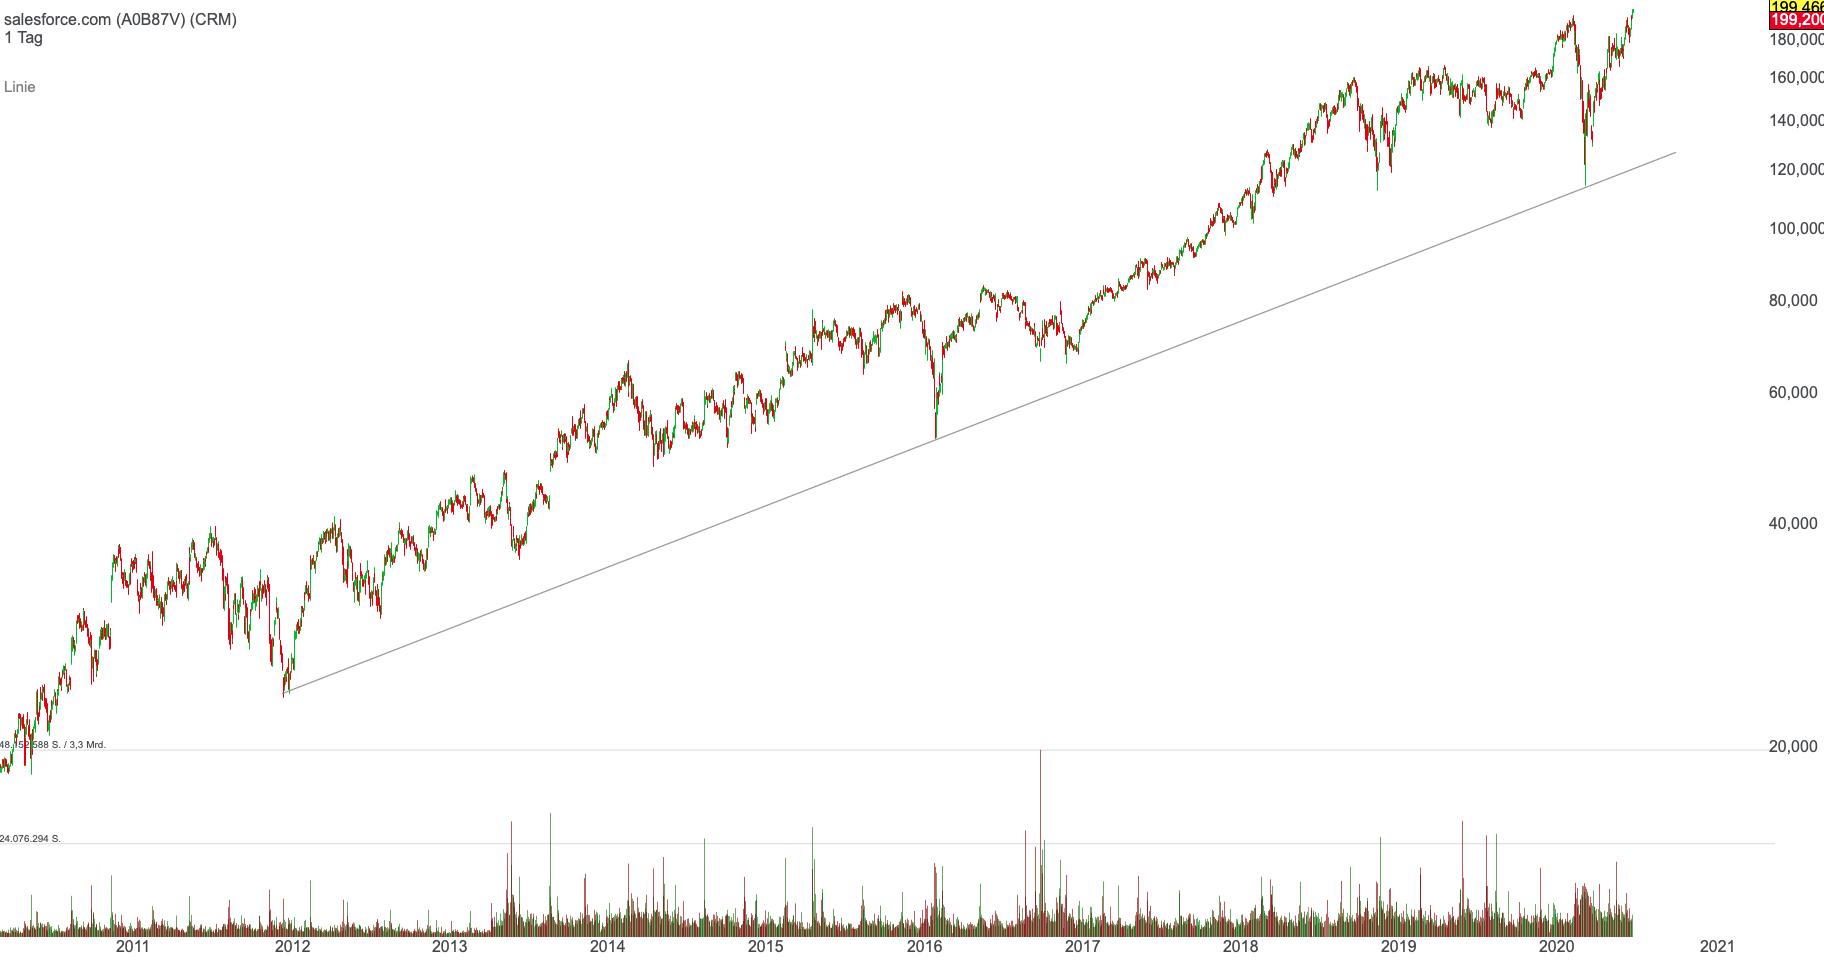 salesforce-langfrist-chart